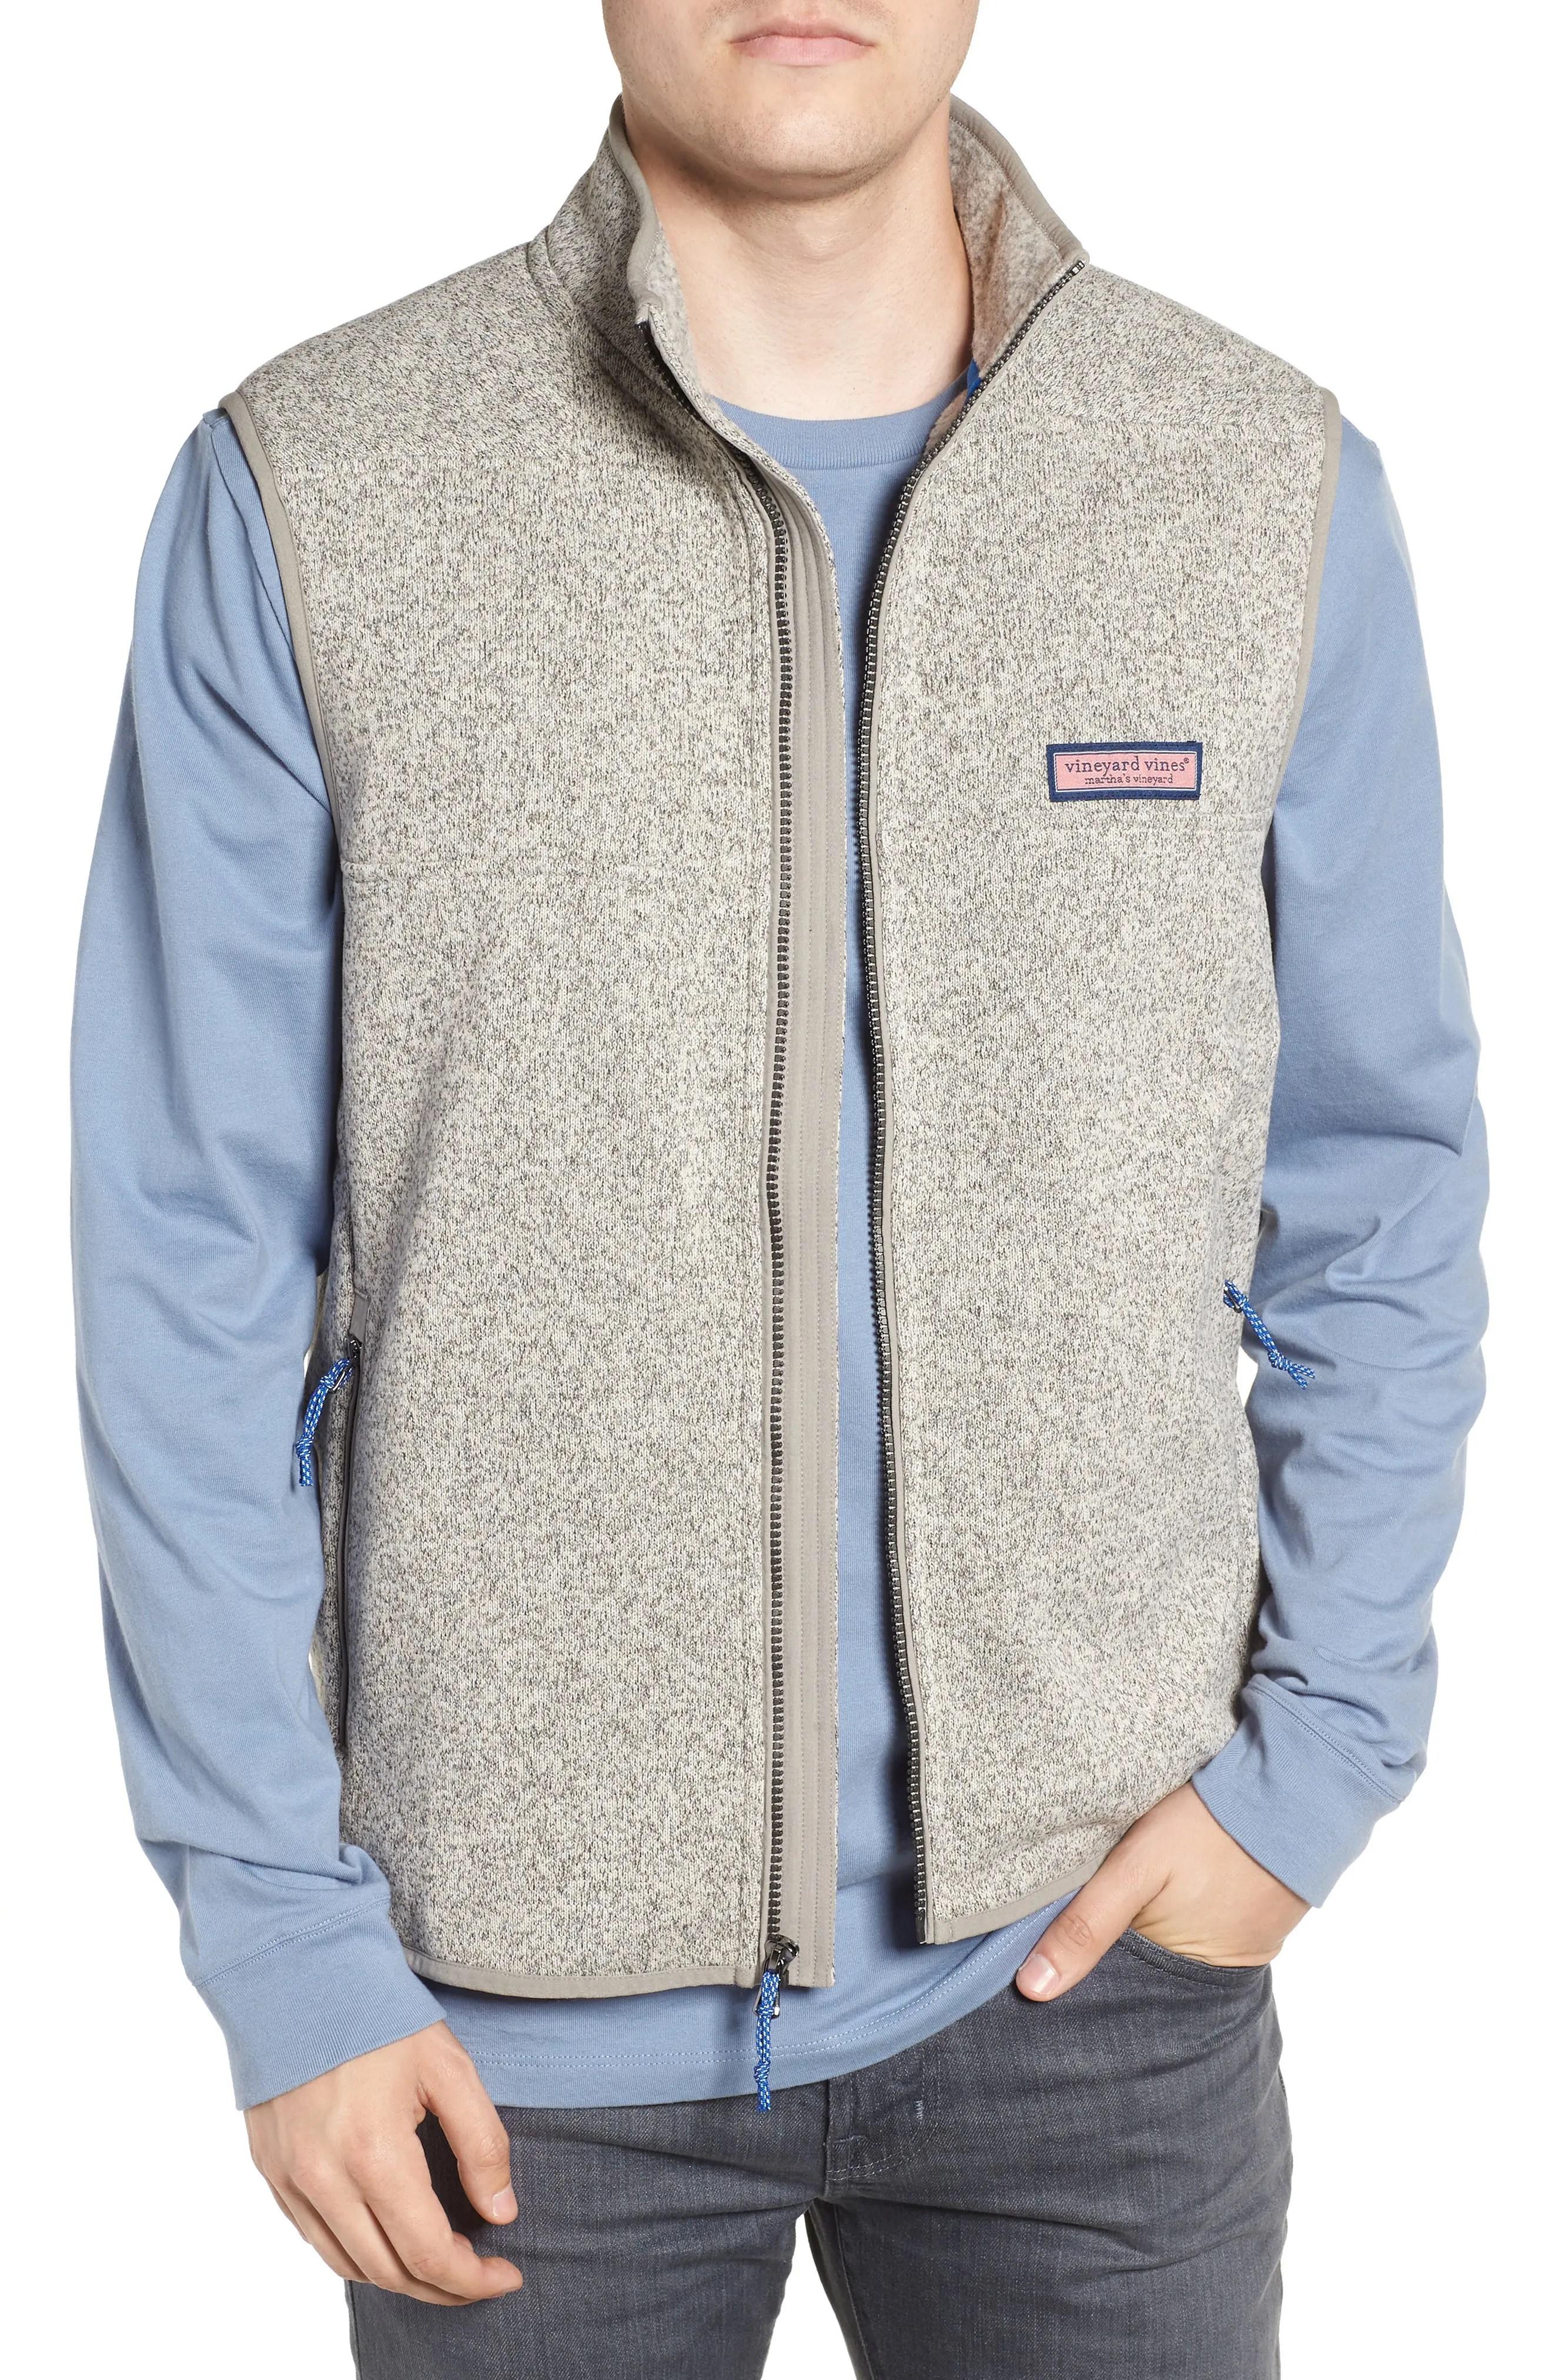 Vineyard vines fleece zip vest also big and tall clothing men   suits more nordstrom rh shoprdstrom